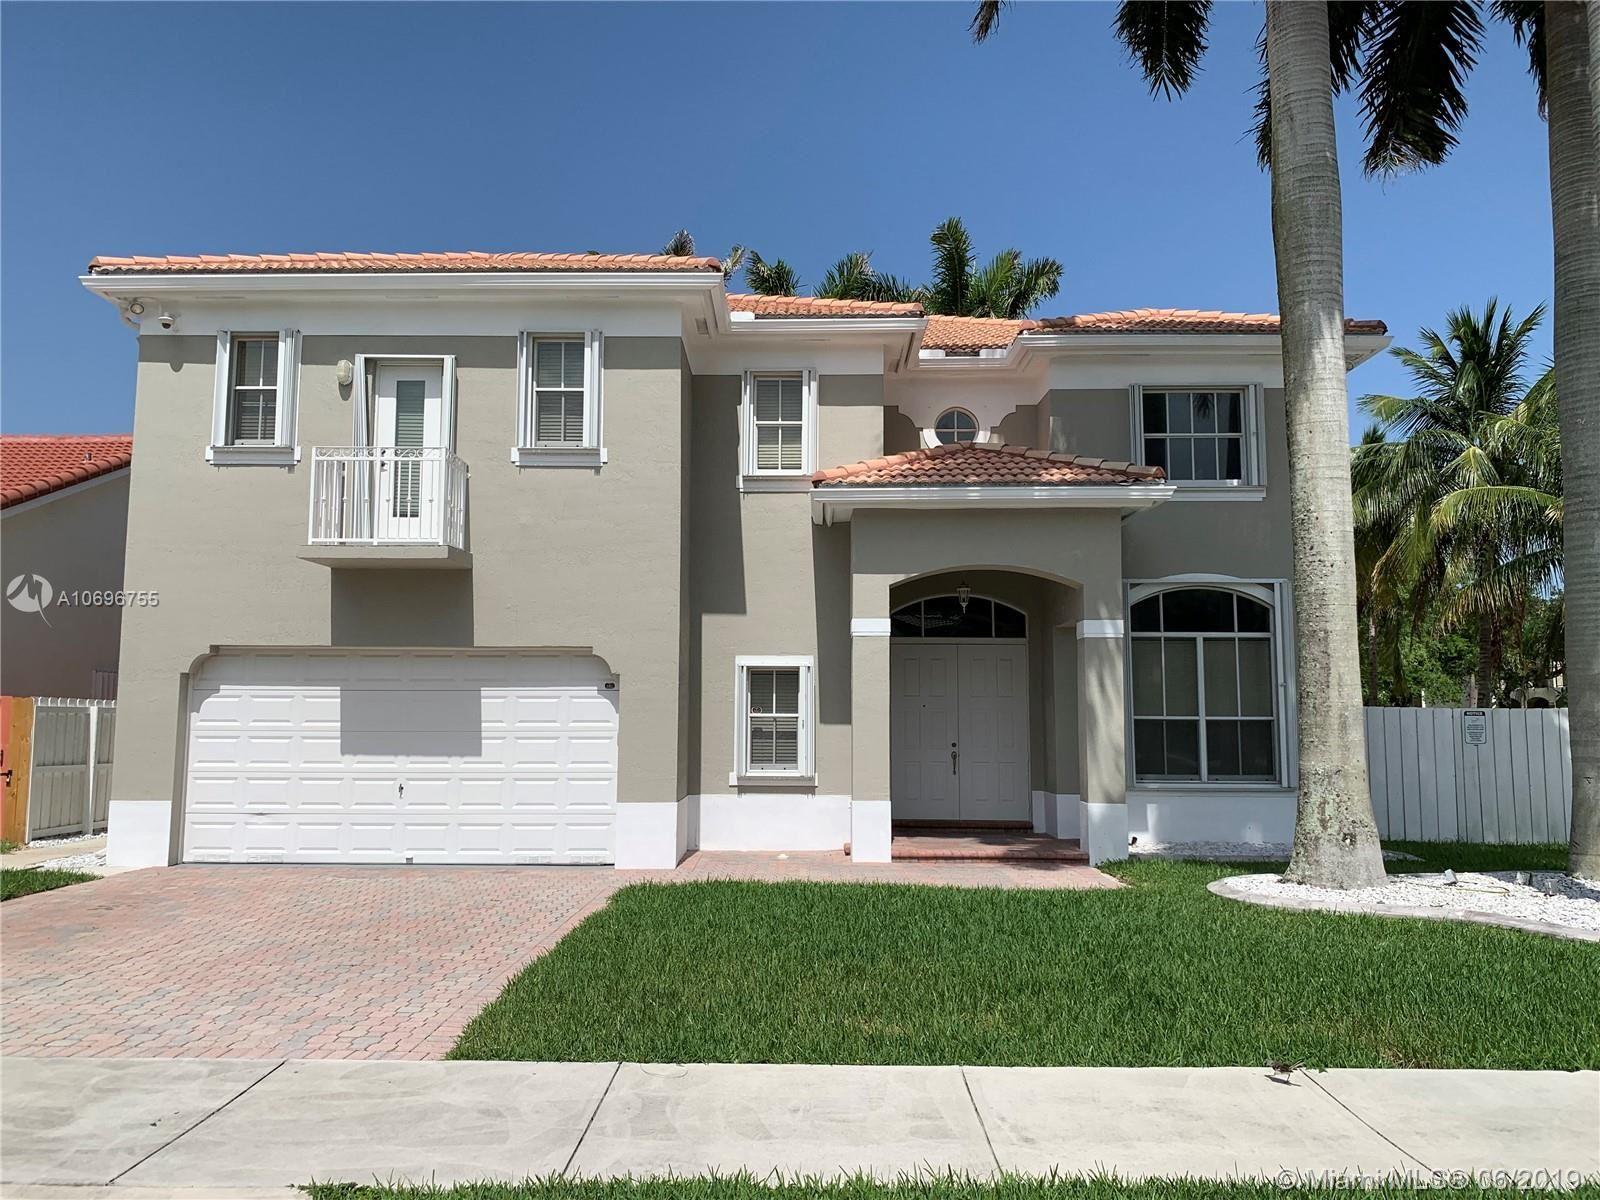 11543 SW 152nd Pl, Miami, FL 33196 - MLS#: A10696755